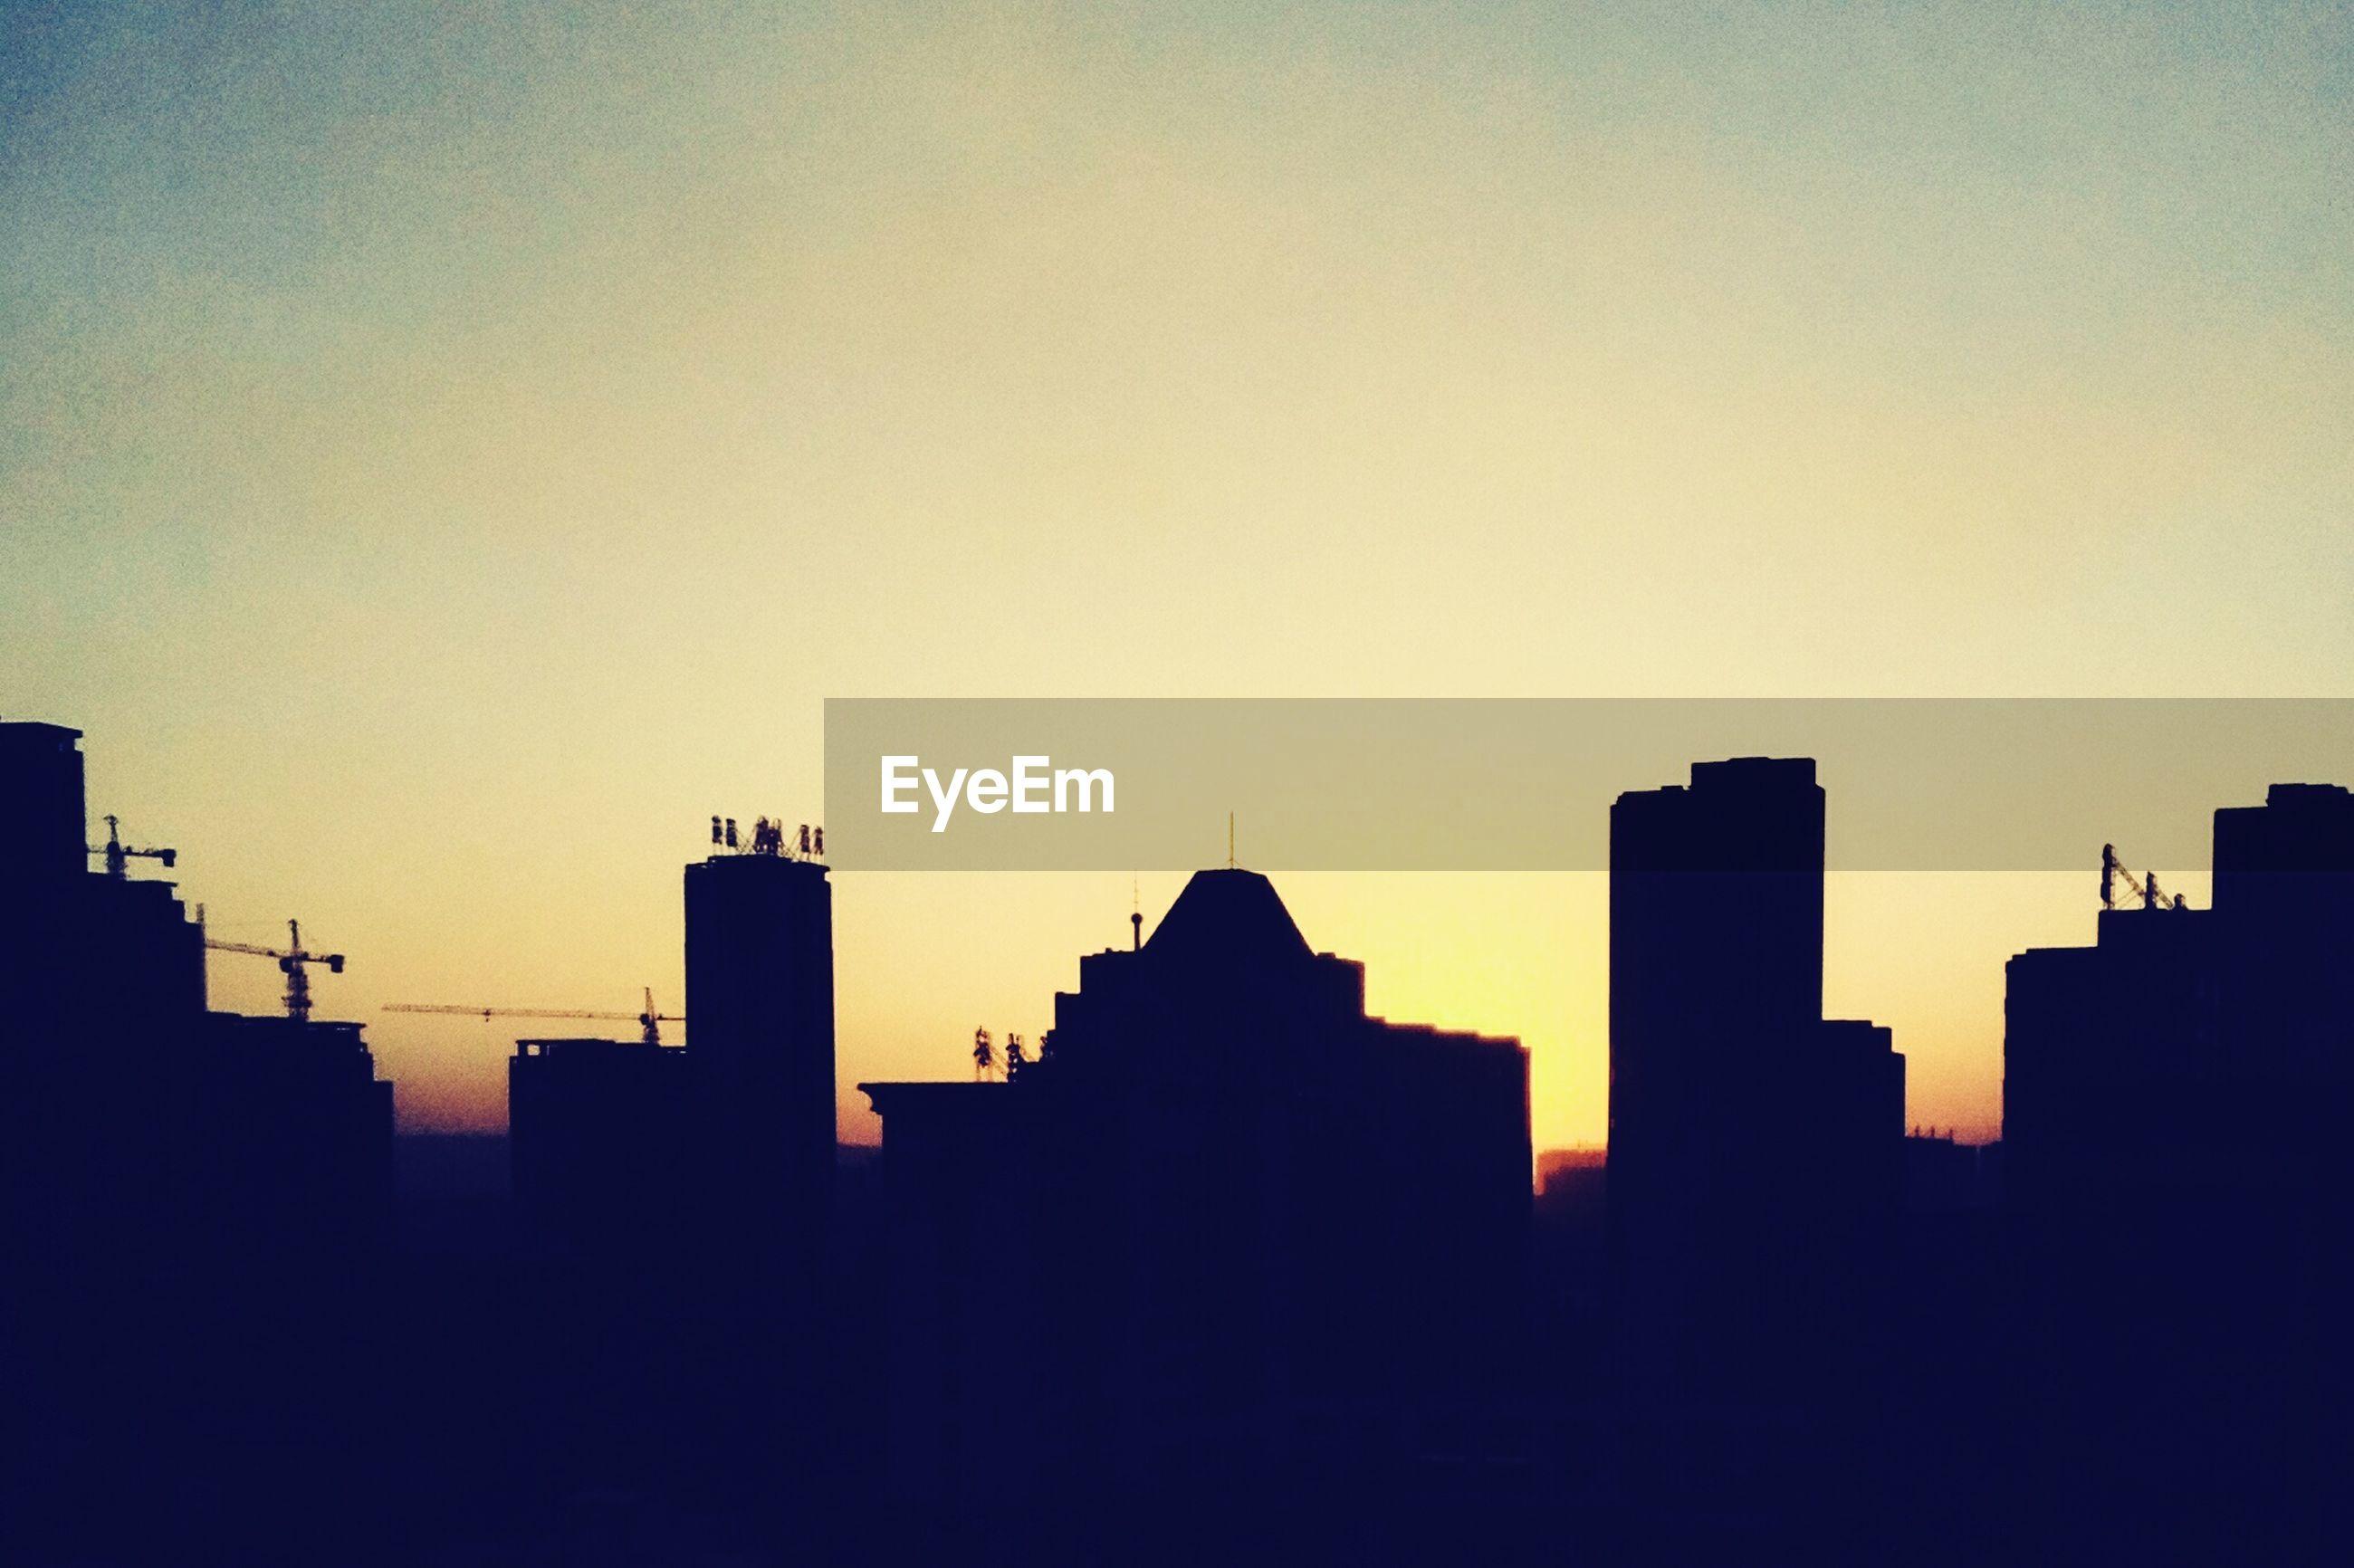 building exterior, silhouette, architecture, sunset, built structure, copy space, clear sky, city, skyscraper, cityscape, urban skyline, skyline, building, orange color, outline, outdoors, dusk, tower, no people, dark